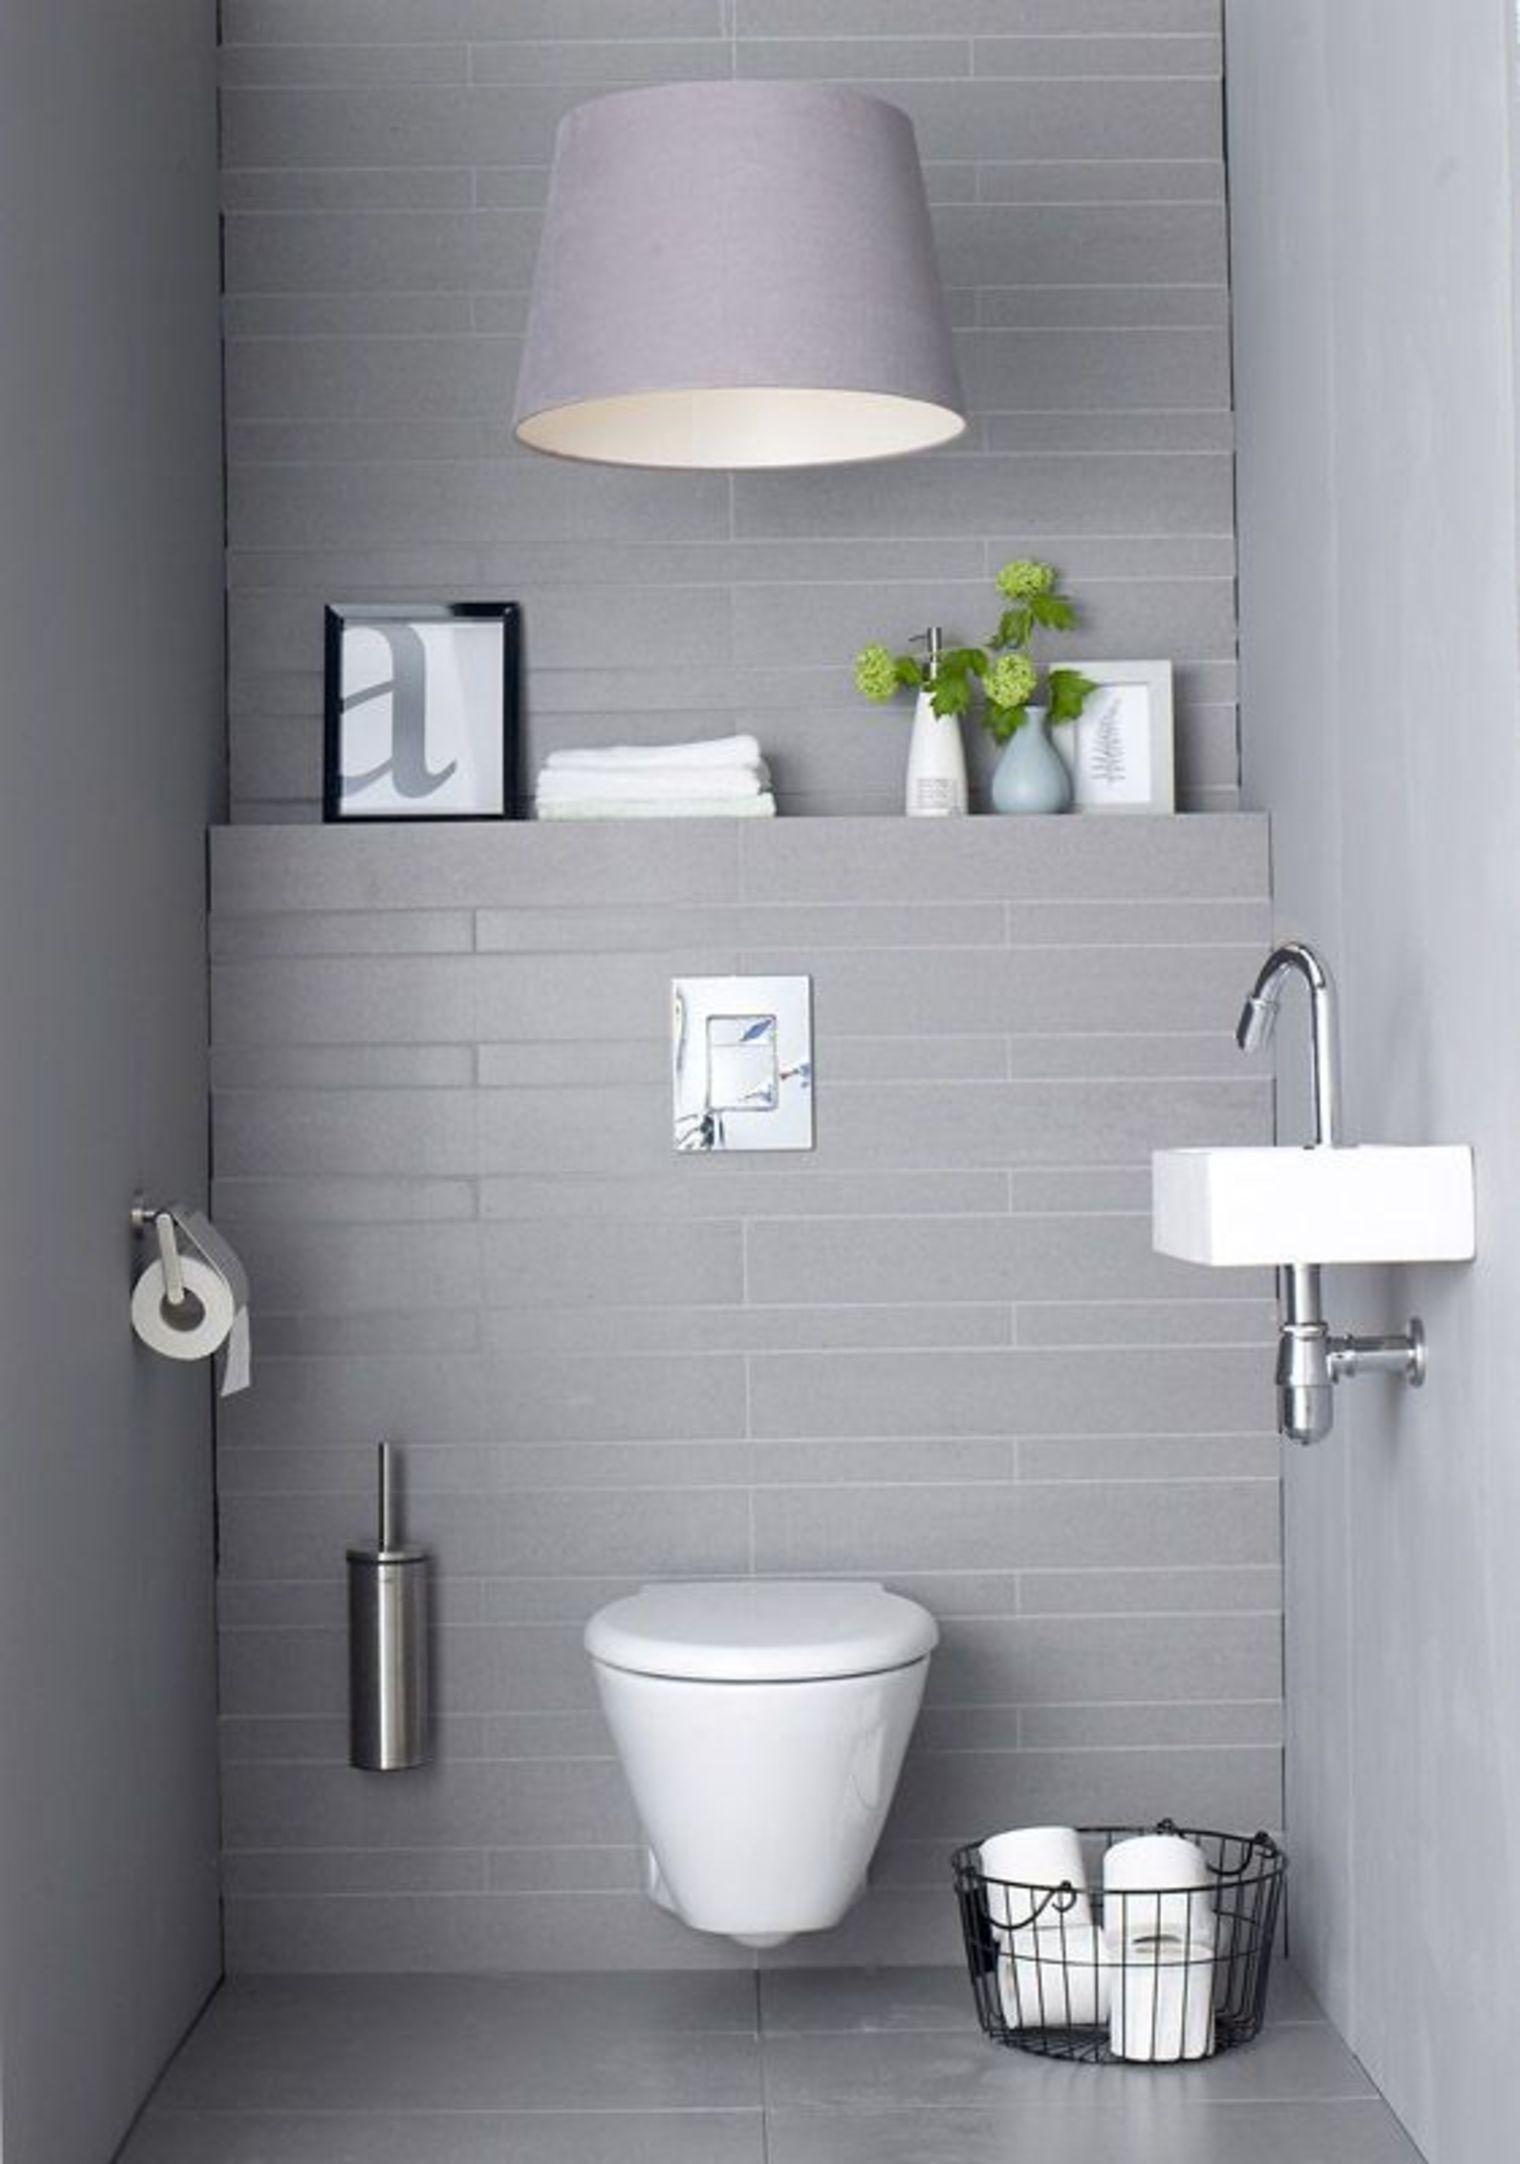 Idée déco WC | Toilet, Tiny houses and Interiors